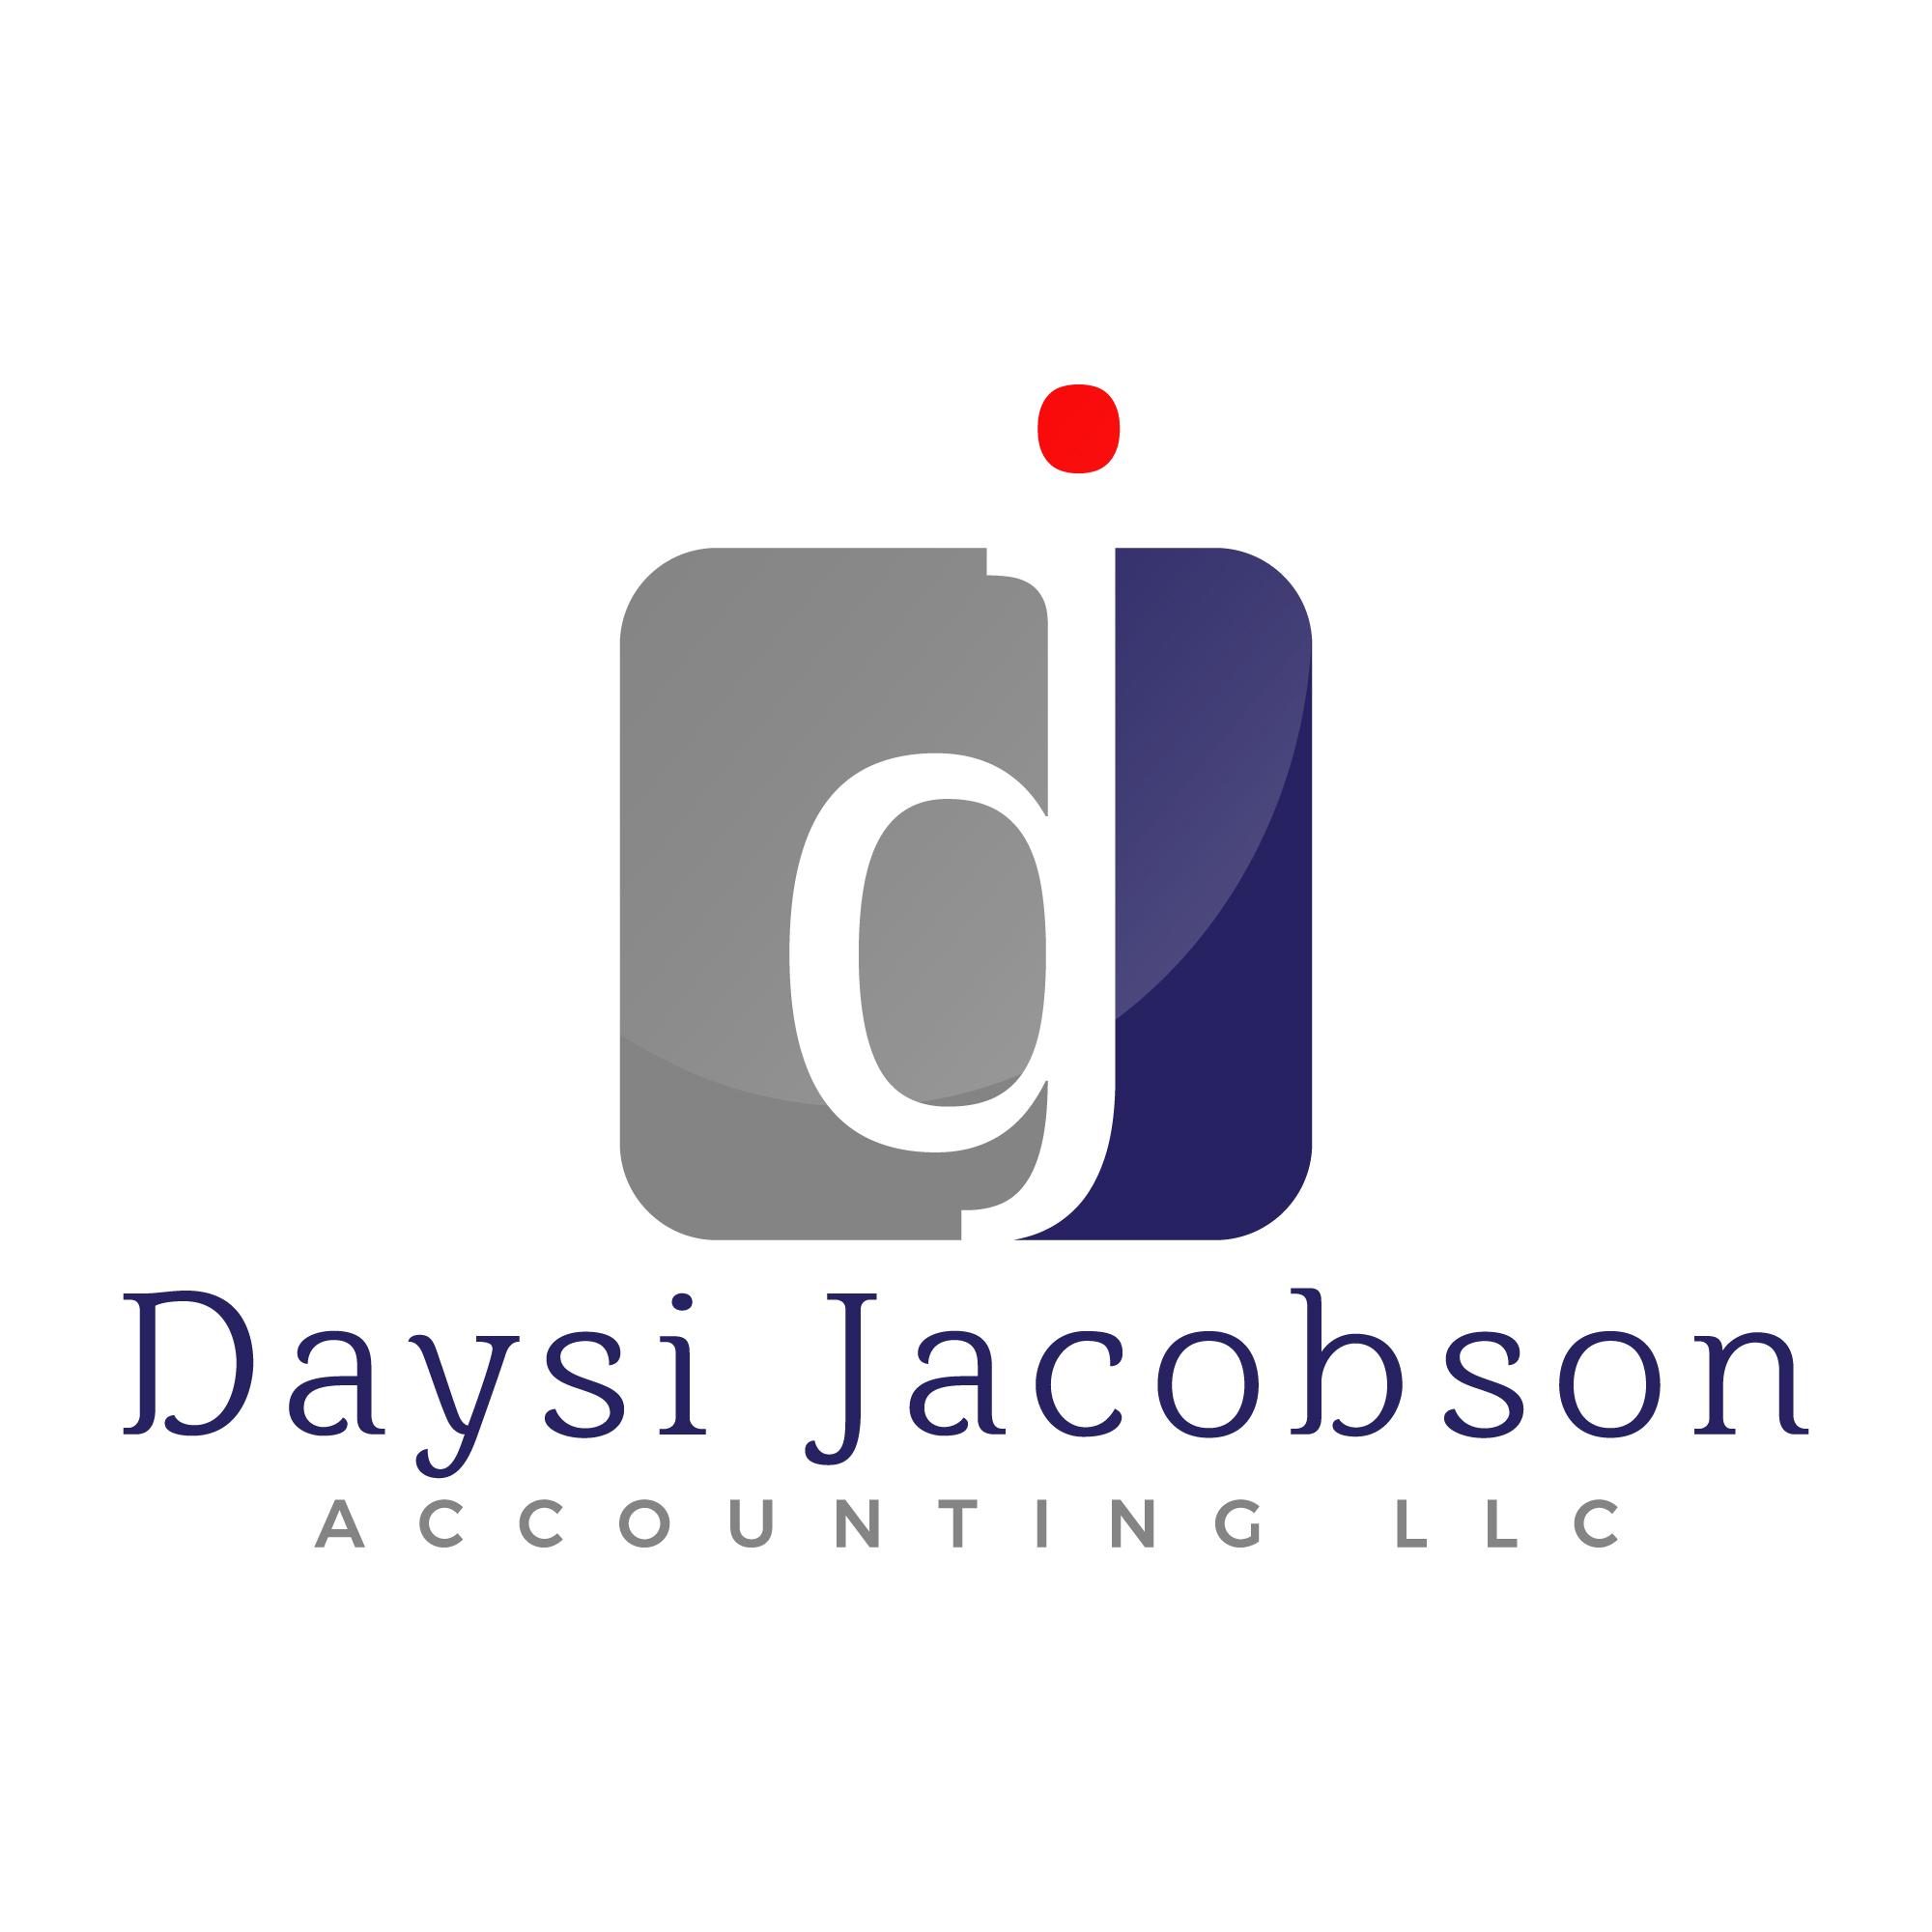 Daysi Jacobson Accounting LLC